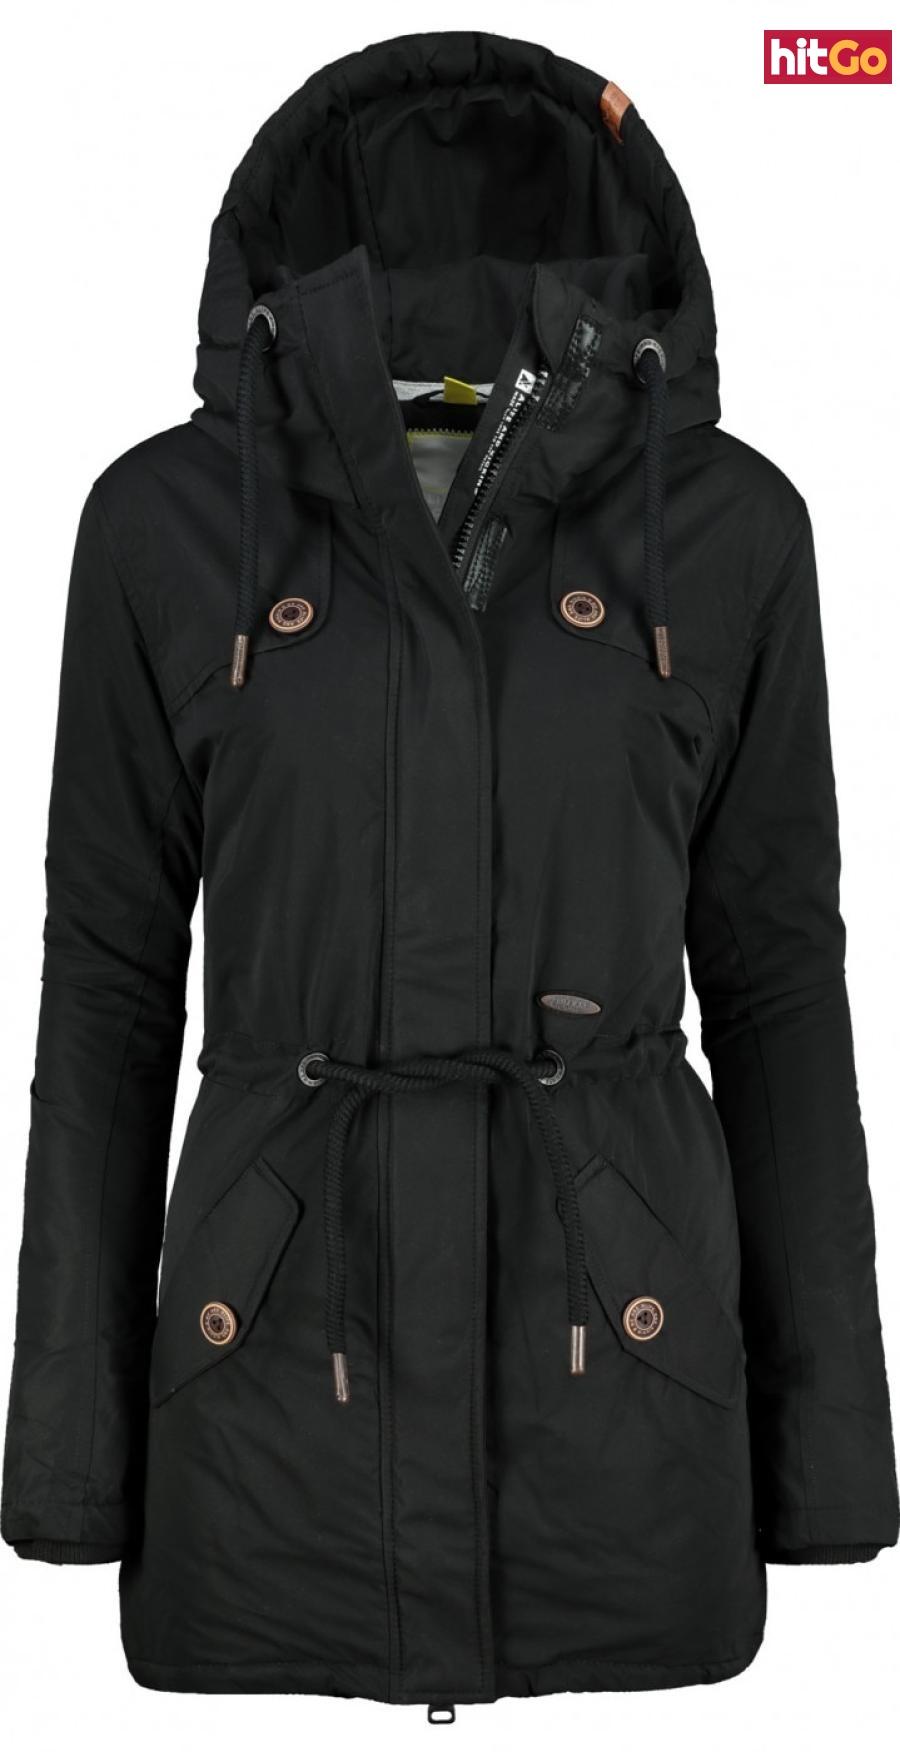 Womens jacket Alife and Kickin Charlotte C dámské Moonless XL